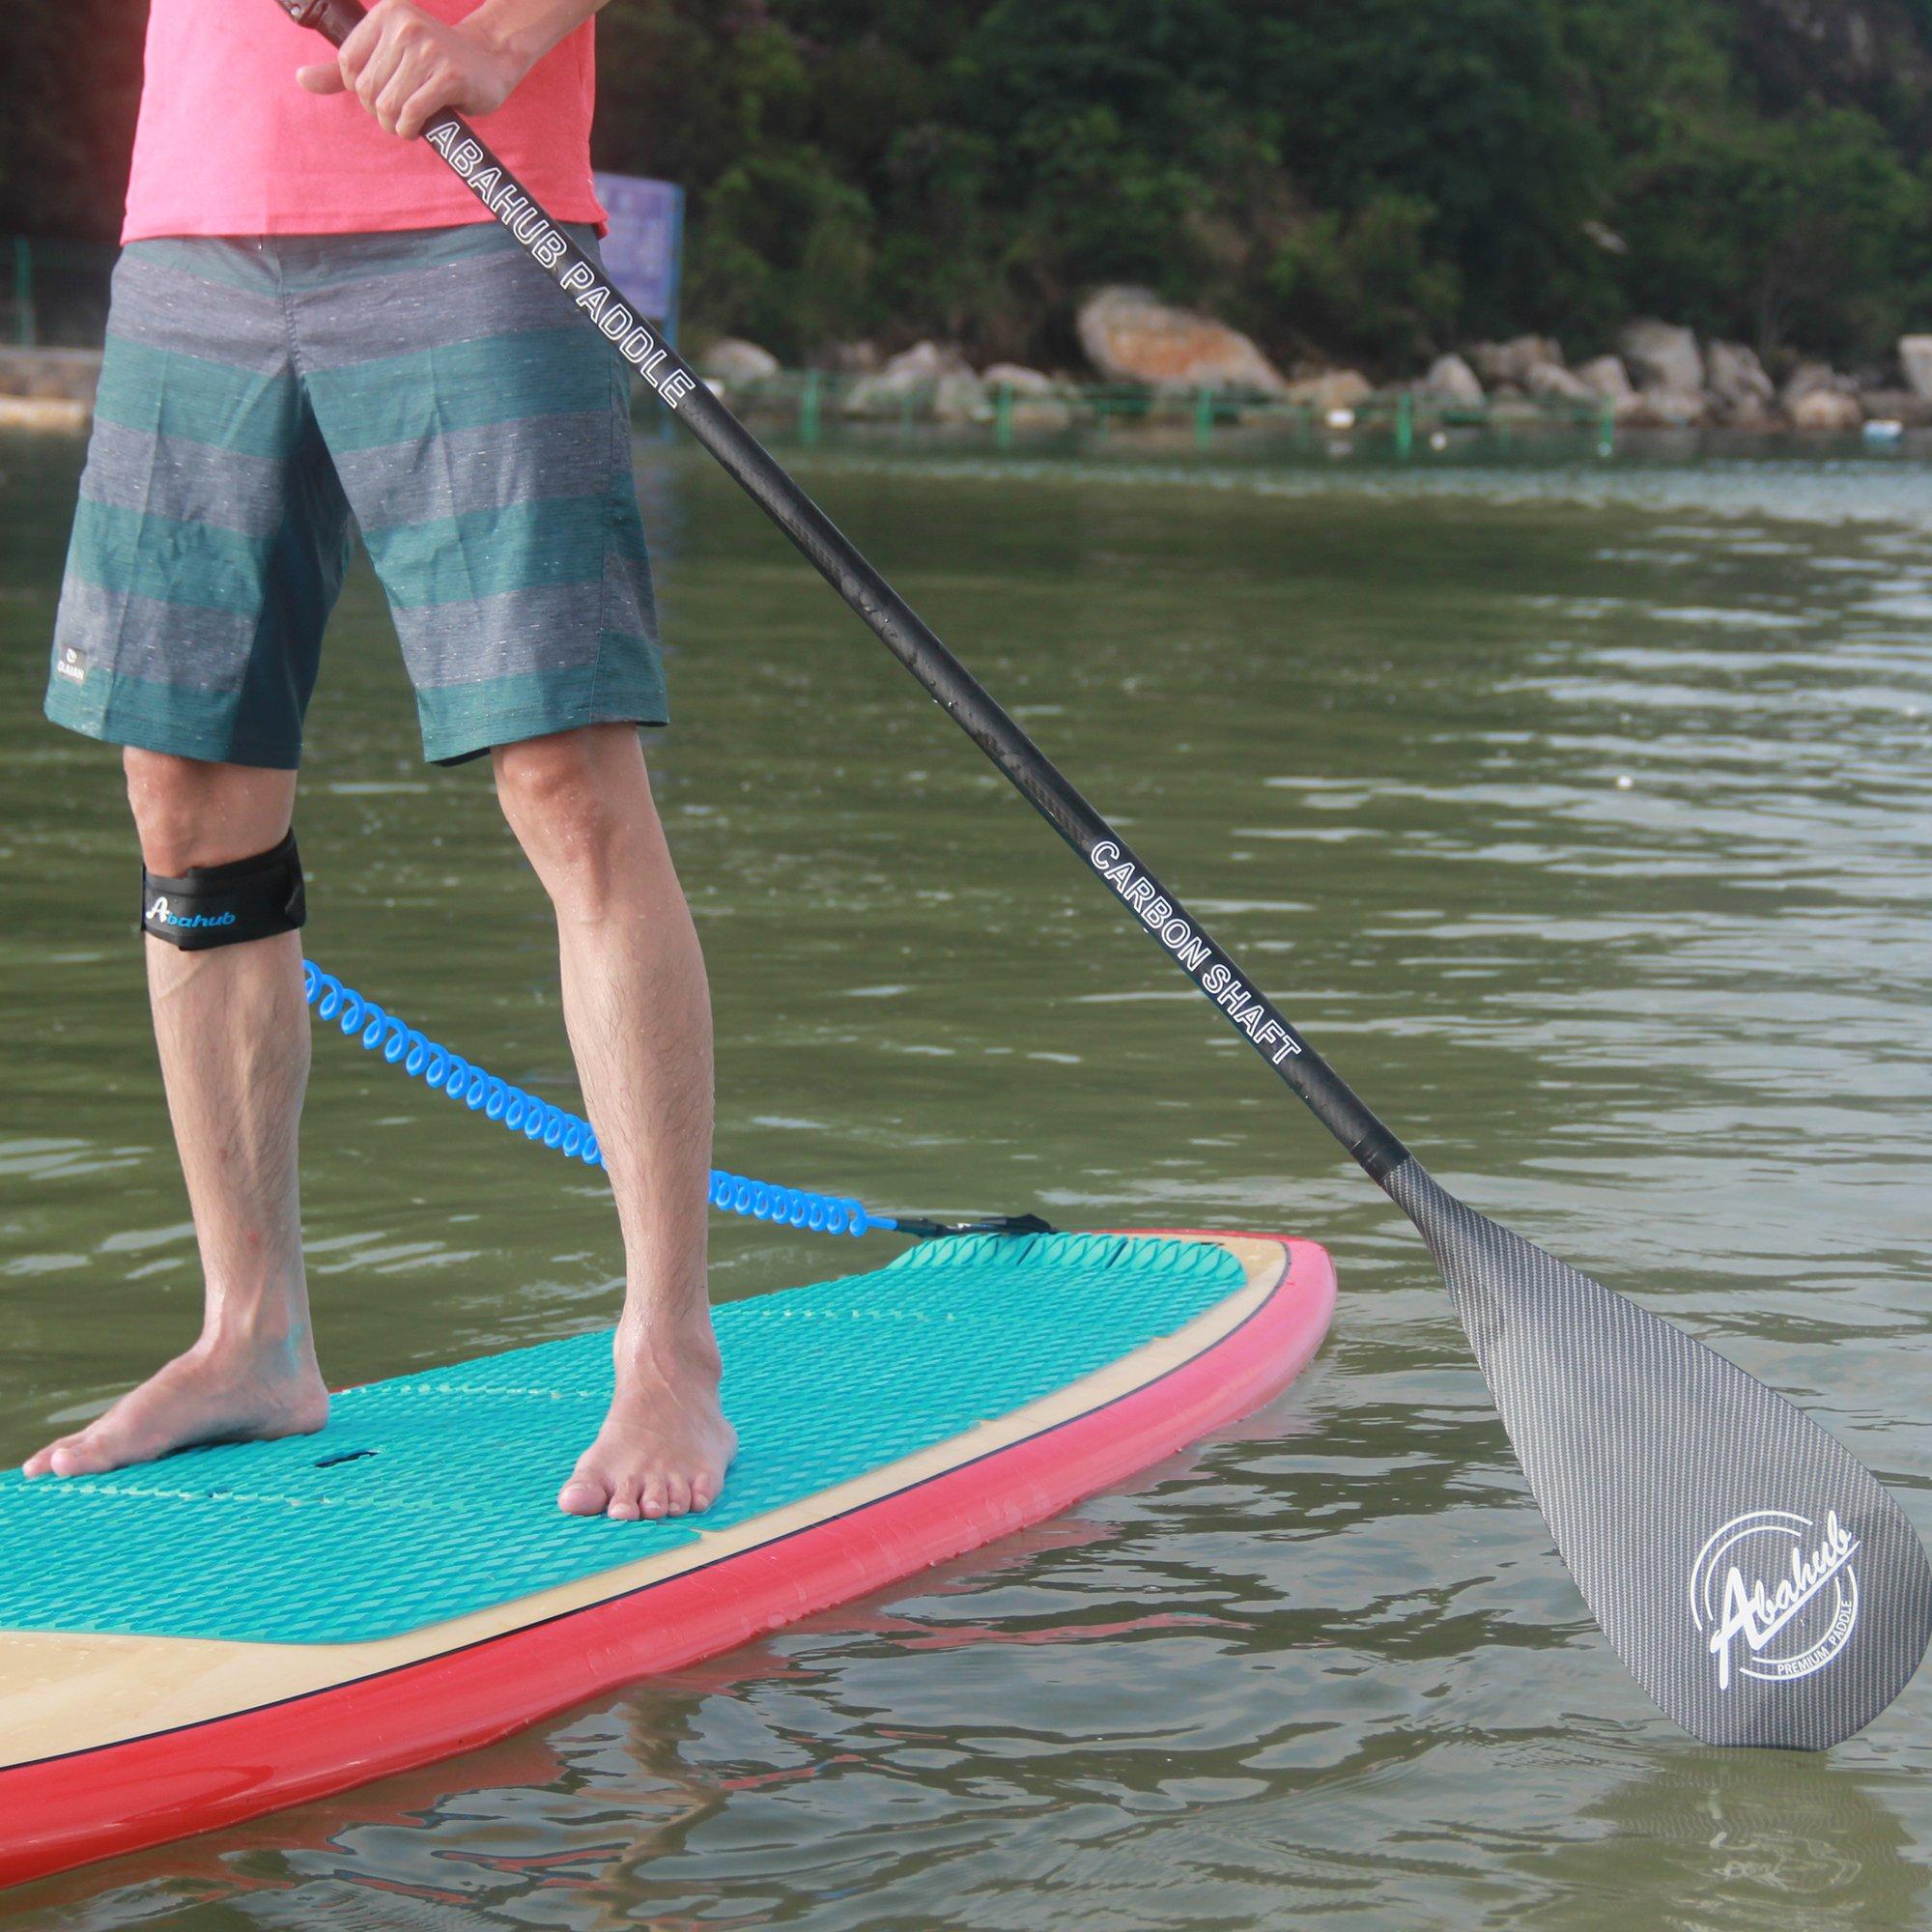 ABAHUB 3-Piece Adjustable Carbon Fiber SUP Paddle Carbon Shaft Carbon Print Plastic Blade + Bag by ABAHUB (Image #4)